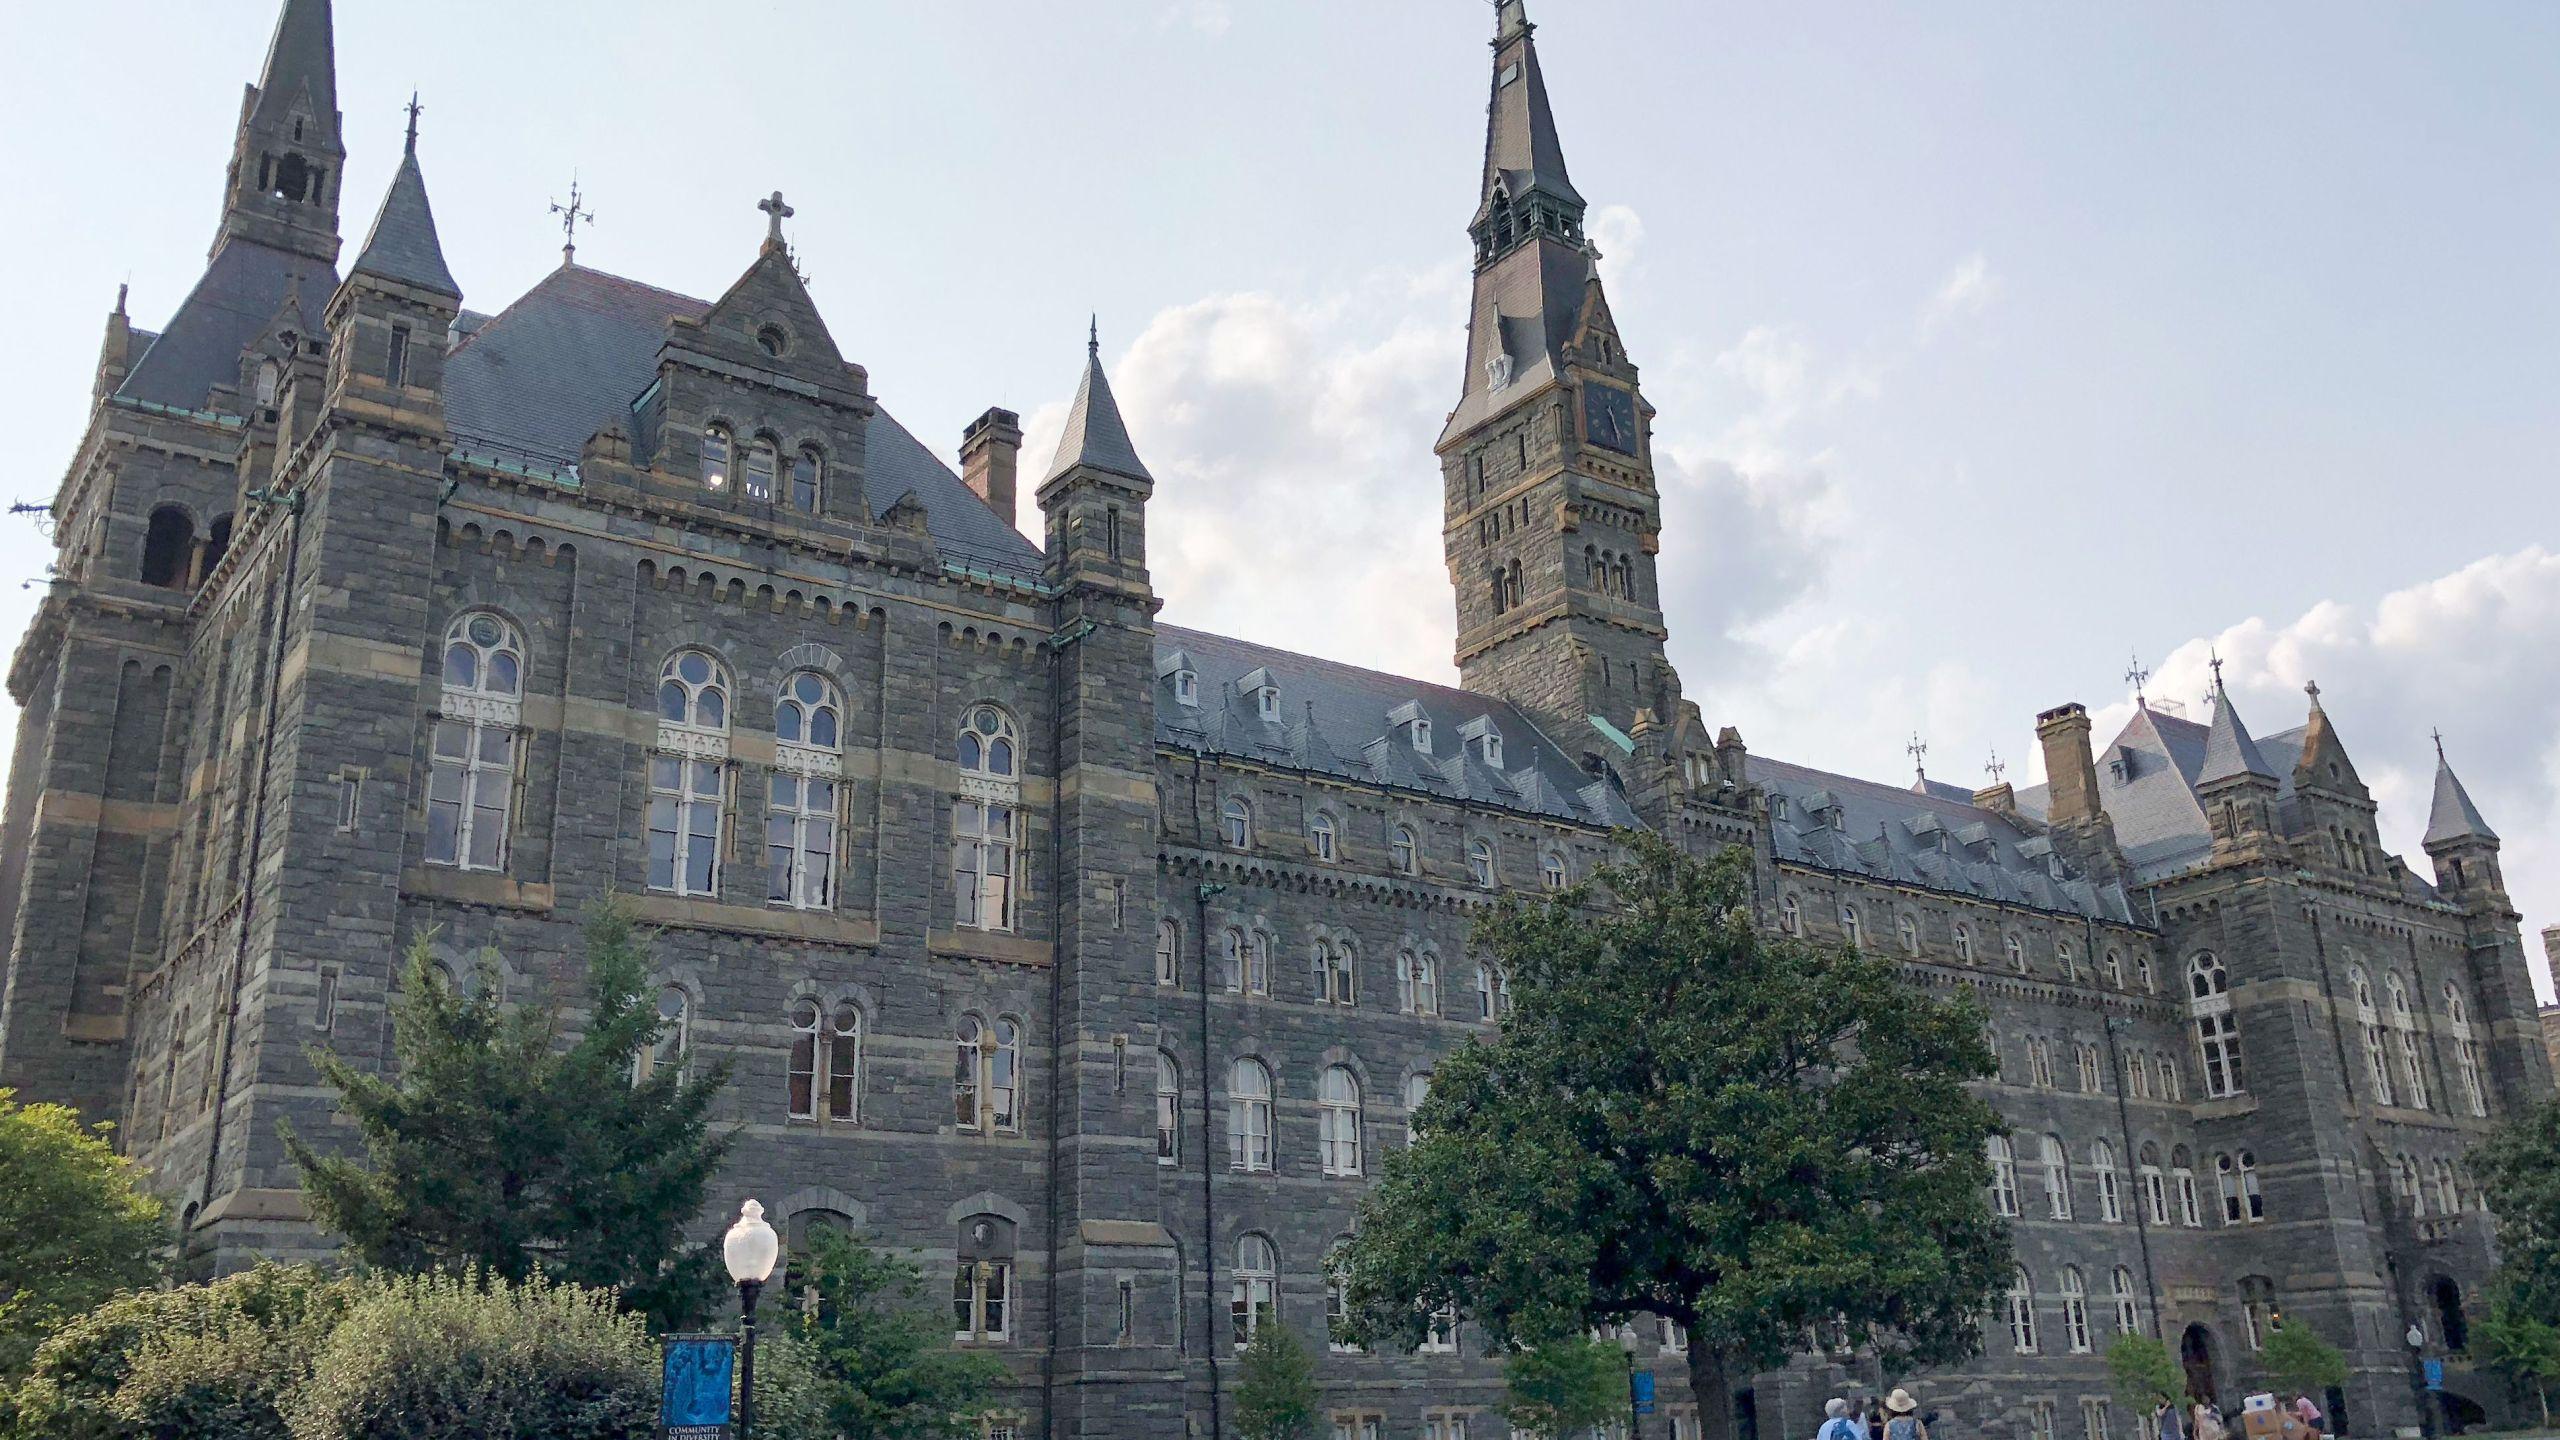 View of Georgetown University campus in the Georgetown neighborhood of Washington, D.C. on August 19, 2018. (Credit: DANIEL SLIM/AFP/Getty Images)